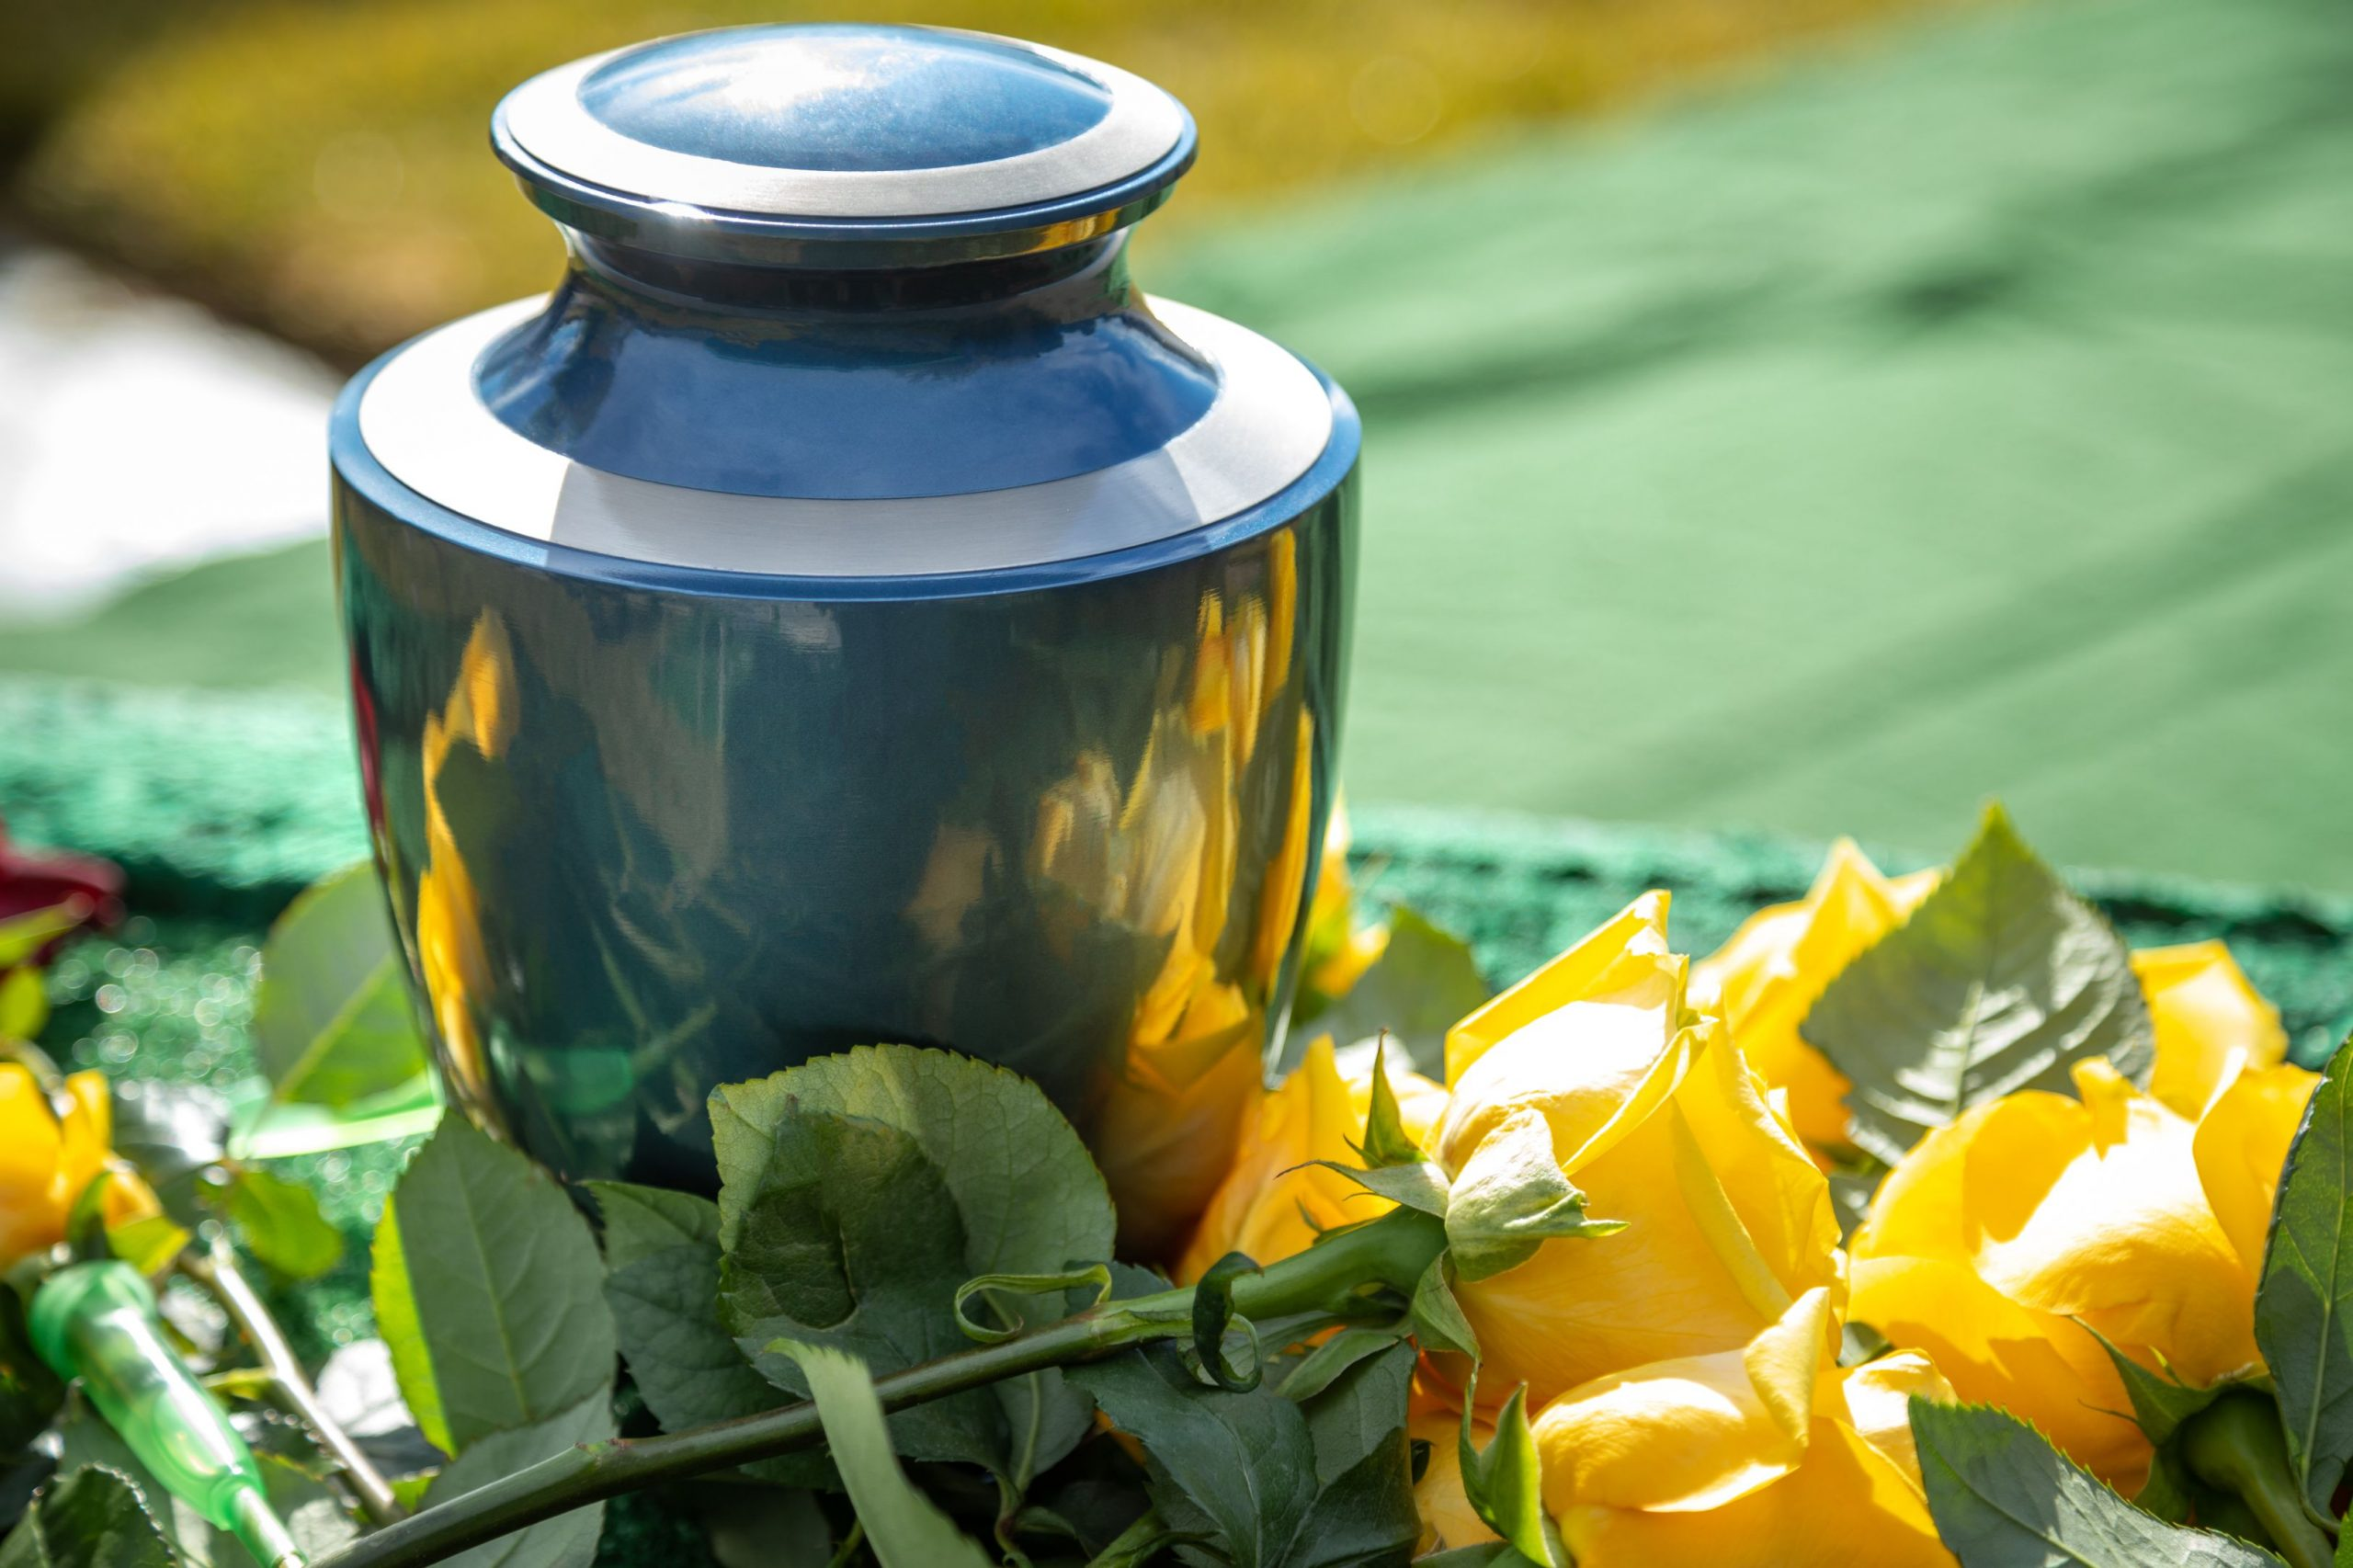 comment choisir urne funeraire